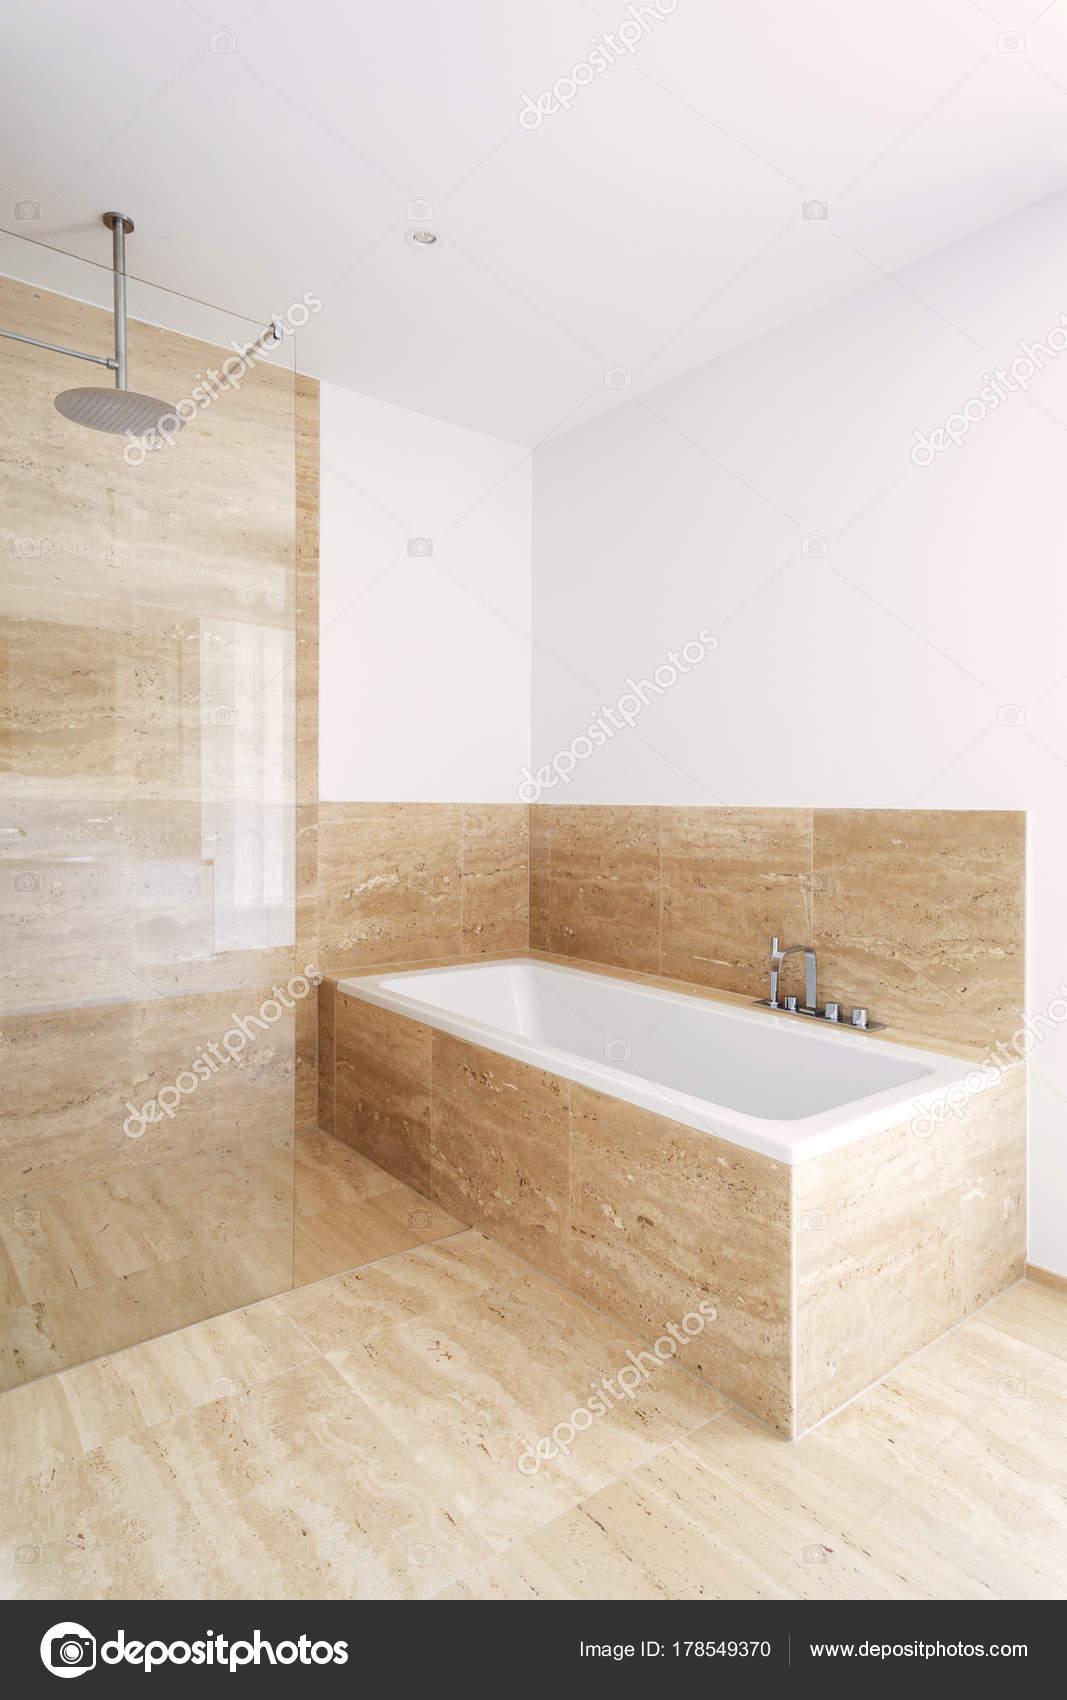 Apartamento Interior Estrenar Bañera Ducha Cuarto Baño Moderno ...